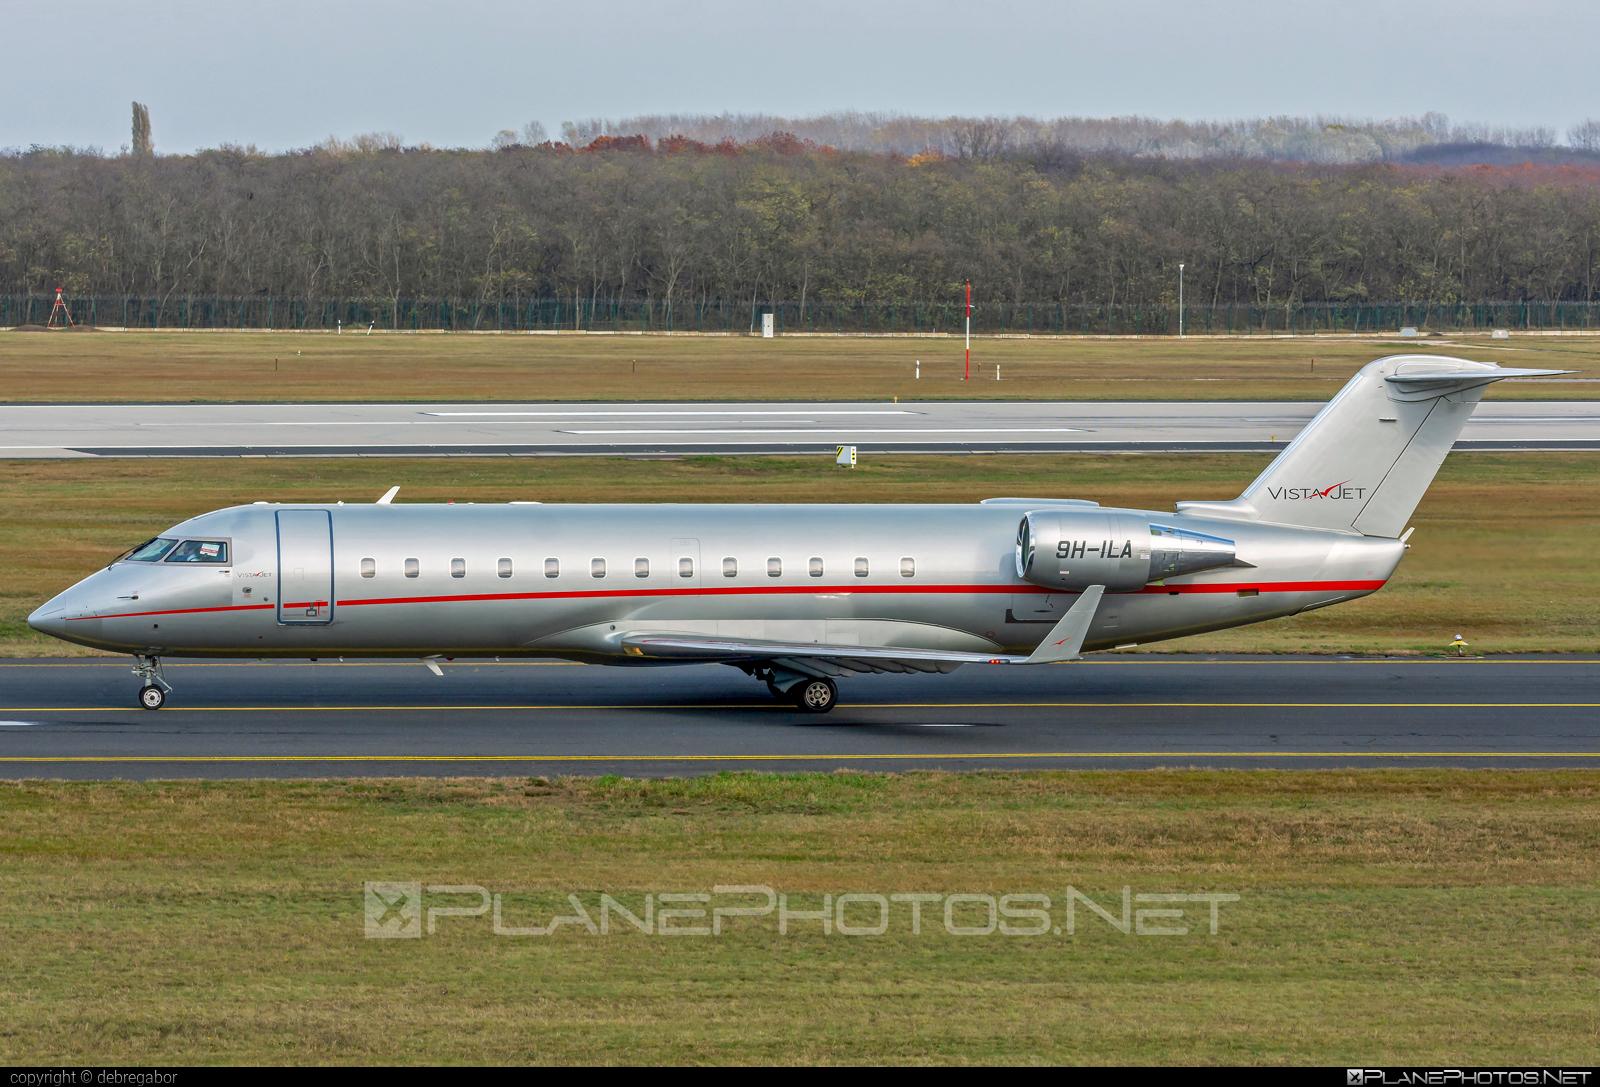 Bombardier CRJ200LR - 9H-ILA operated by VistaJet #bombardier #crj200 #crj200lr #vistajet